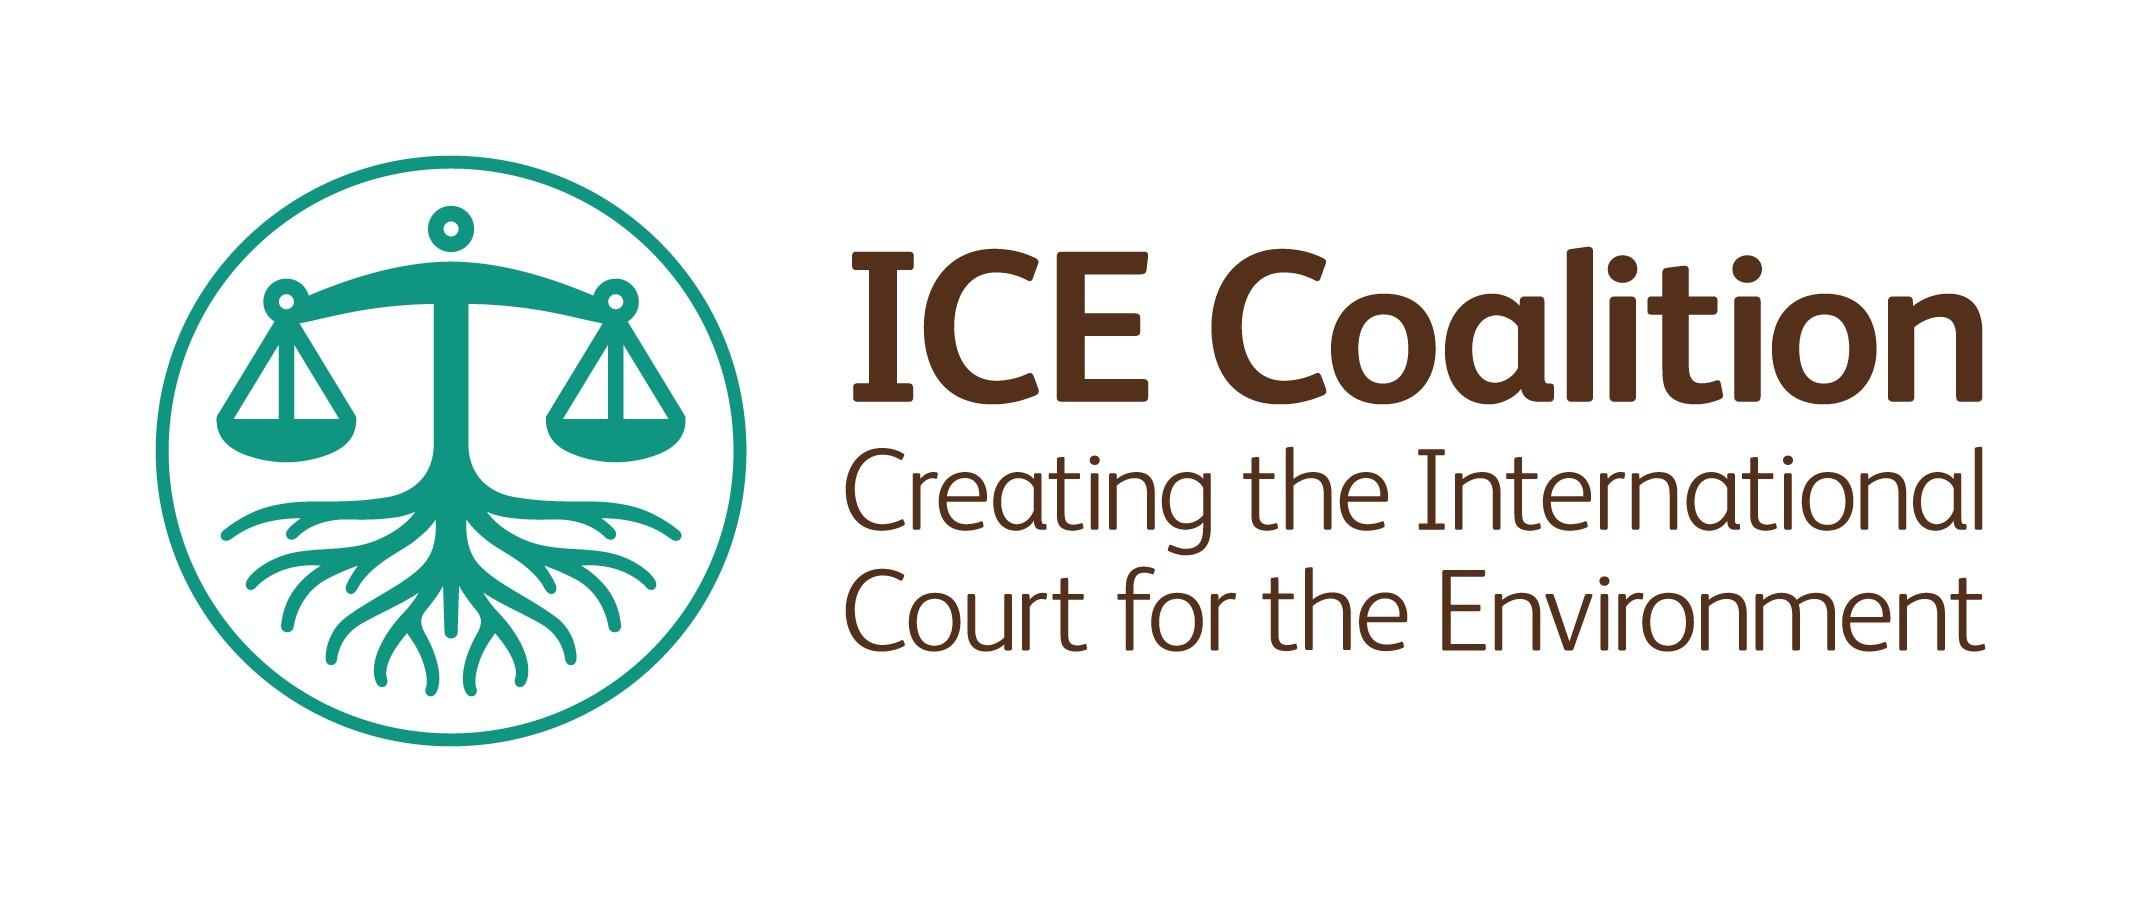 ice coalition